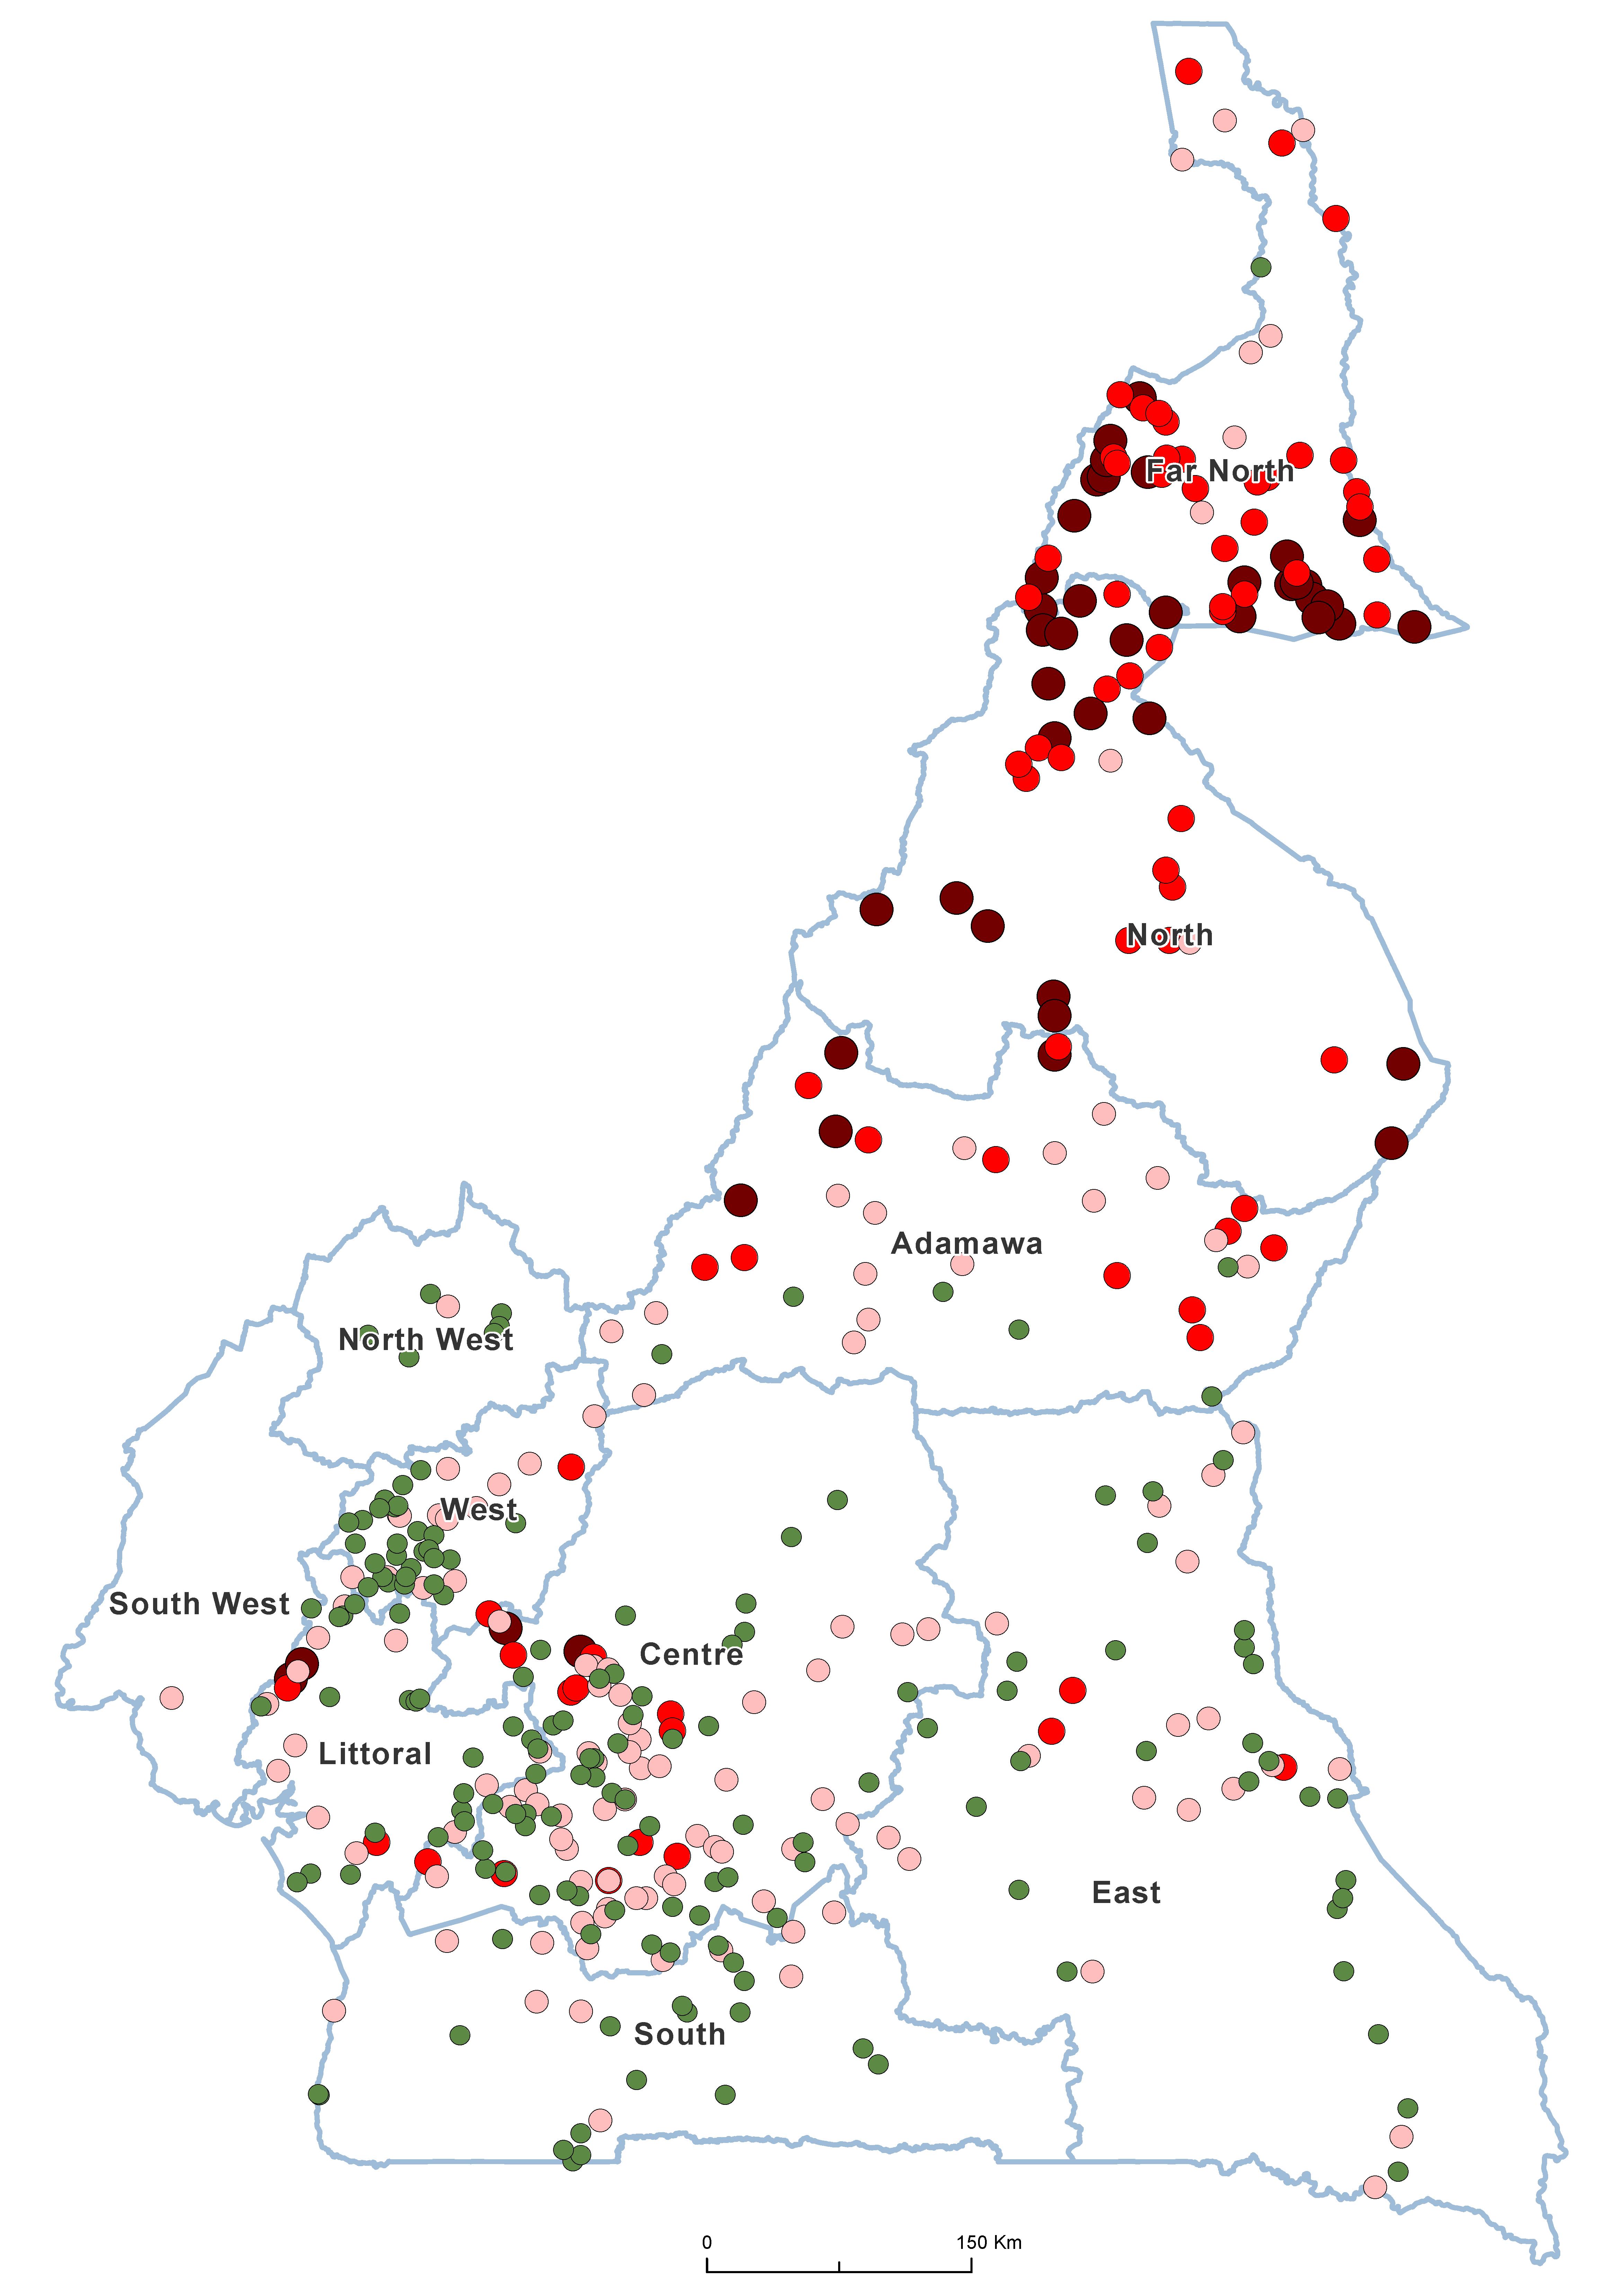 SCH-Prevalence by School 19850001